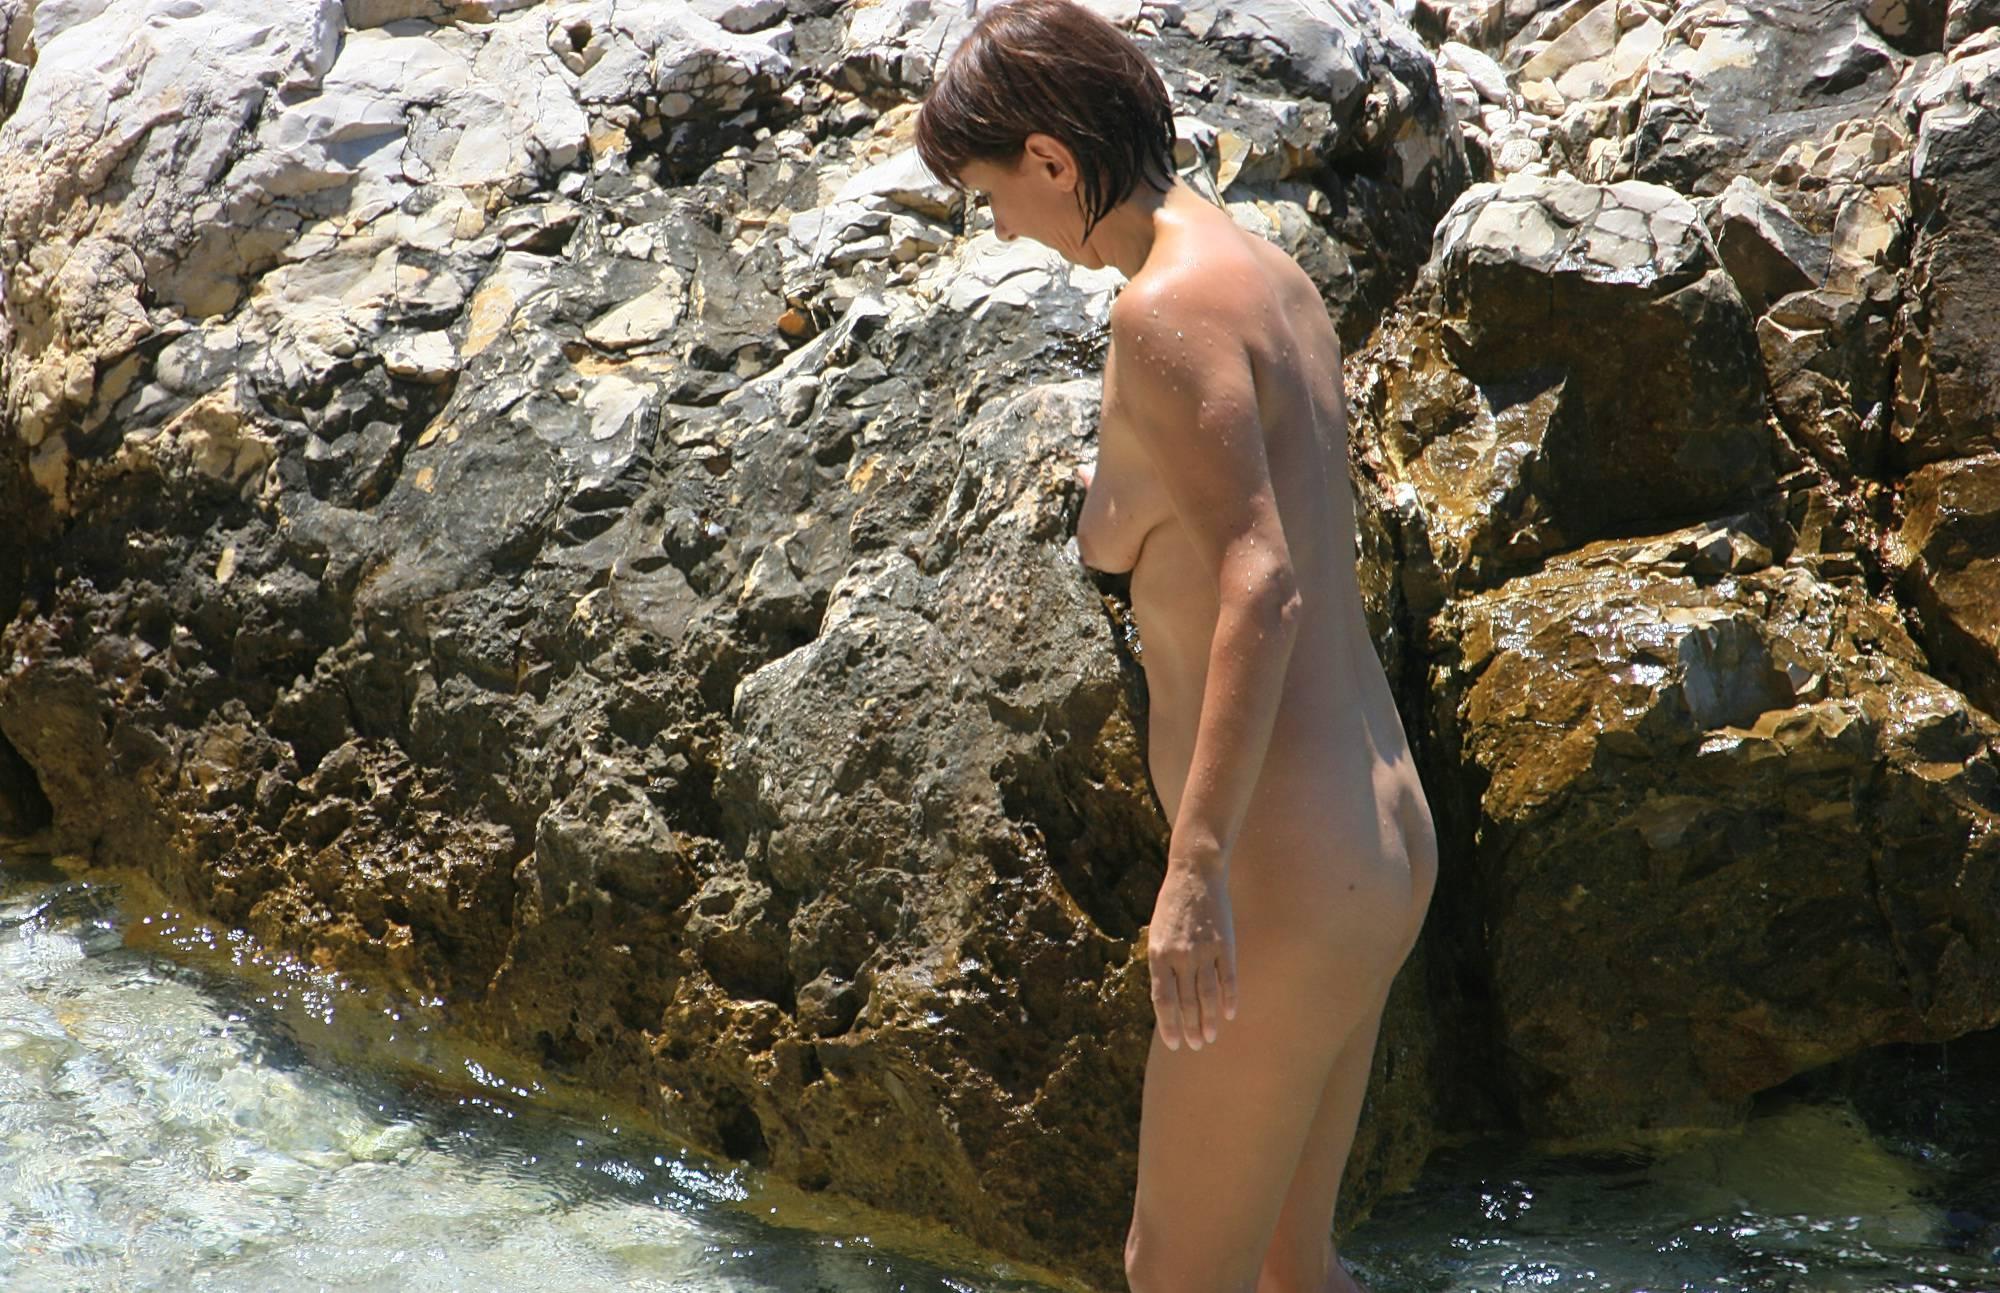 Nudist Photos Colorful Ocean Waterfront - 2